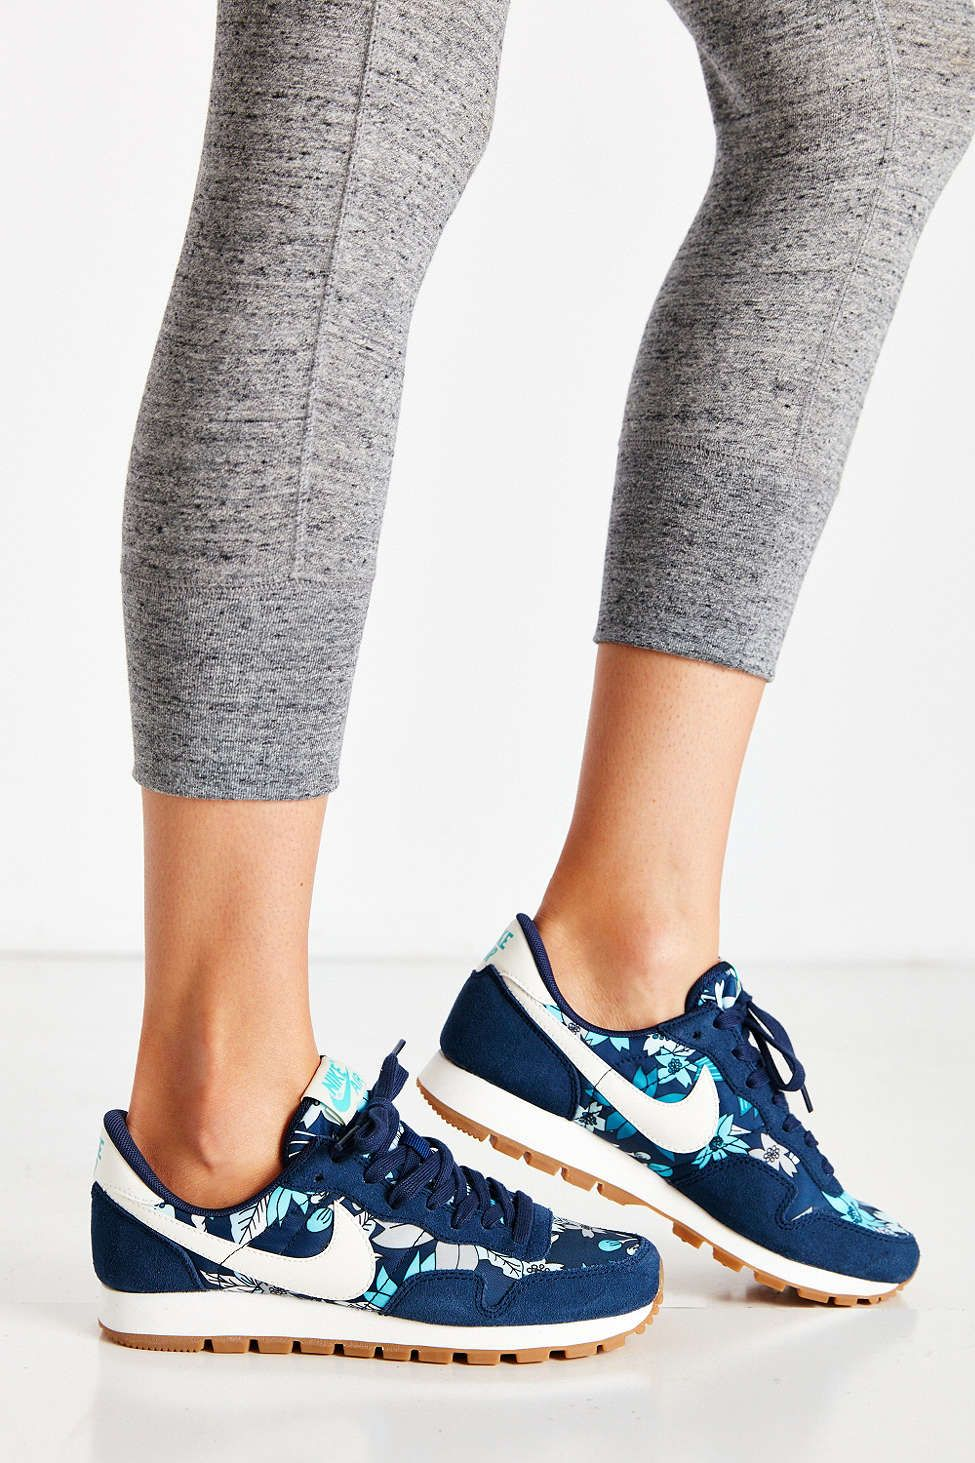 LoveYeezy SneakerOutfits 350 Print Air I Nike Pegasus 83 RA4c5jLq3